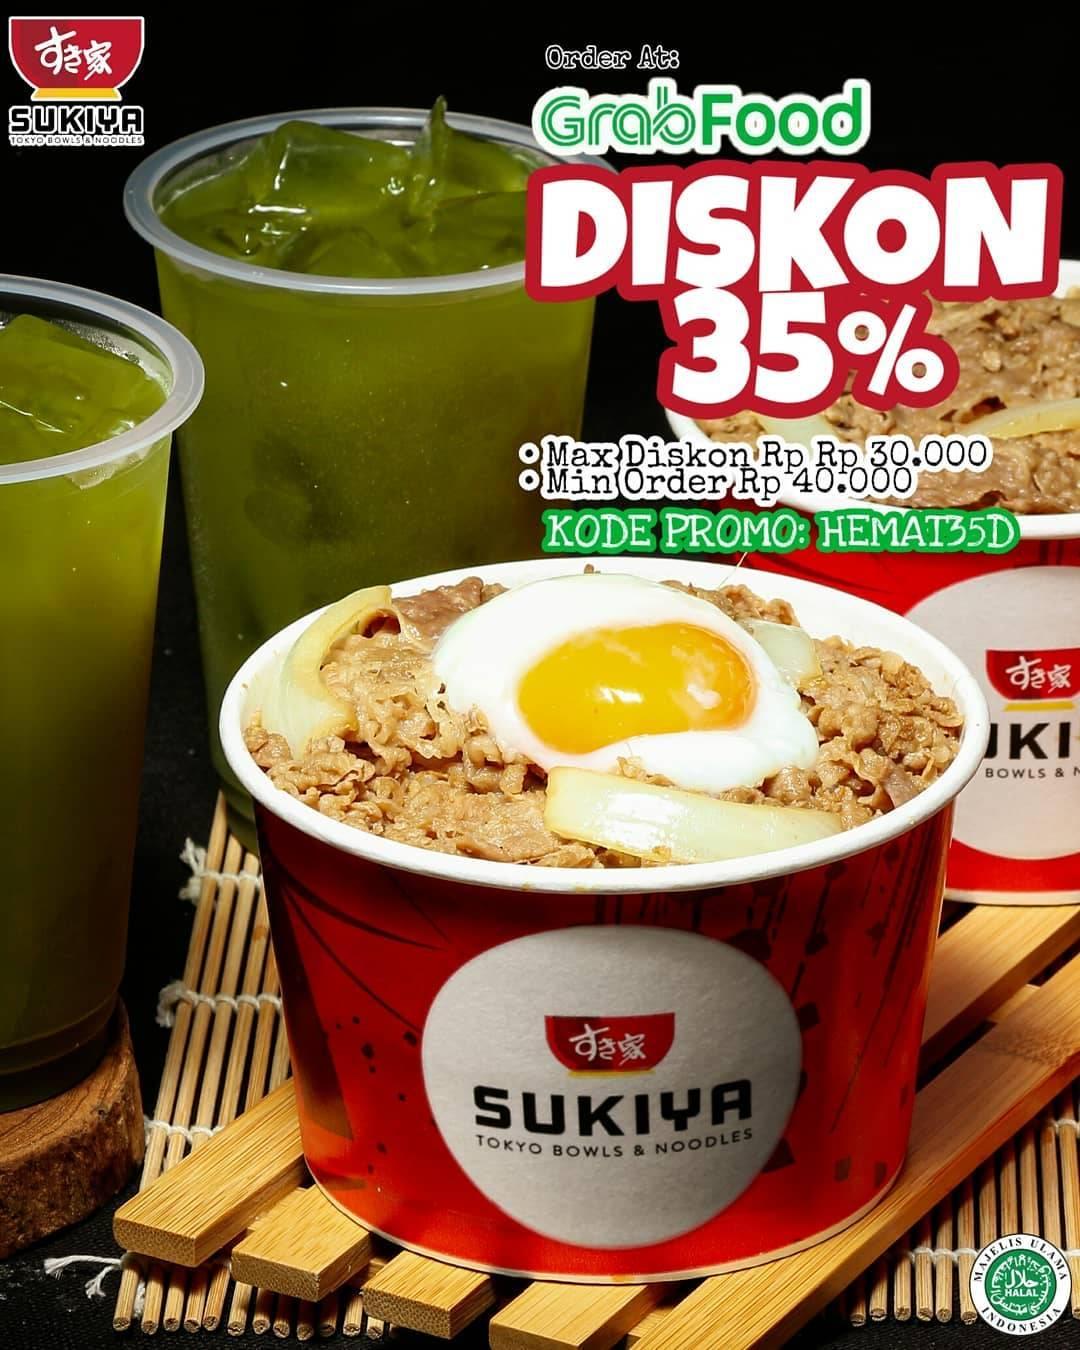 Diskon Sukiya Diskon 35% Di Grabfood